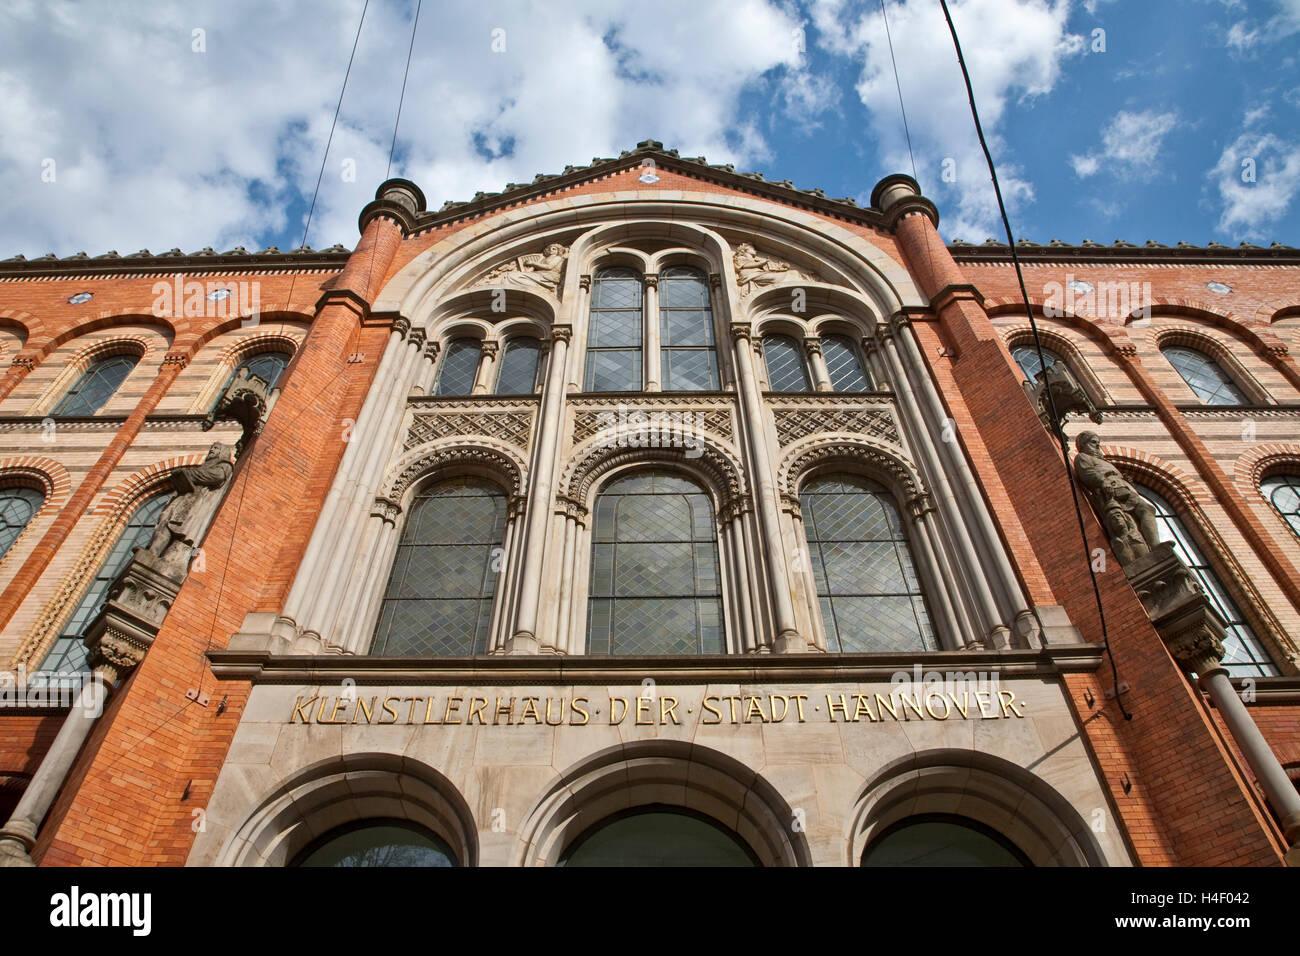 Facade, Kuenstlerhaus art building, Hannover, Lower Saxony - Stock Image